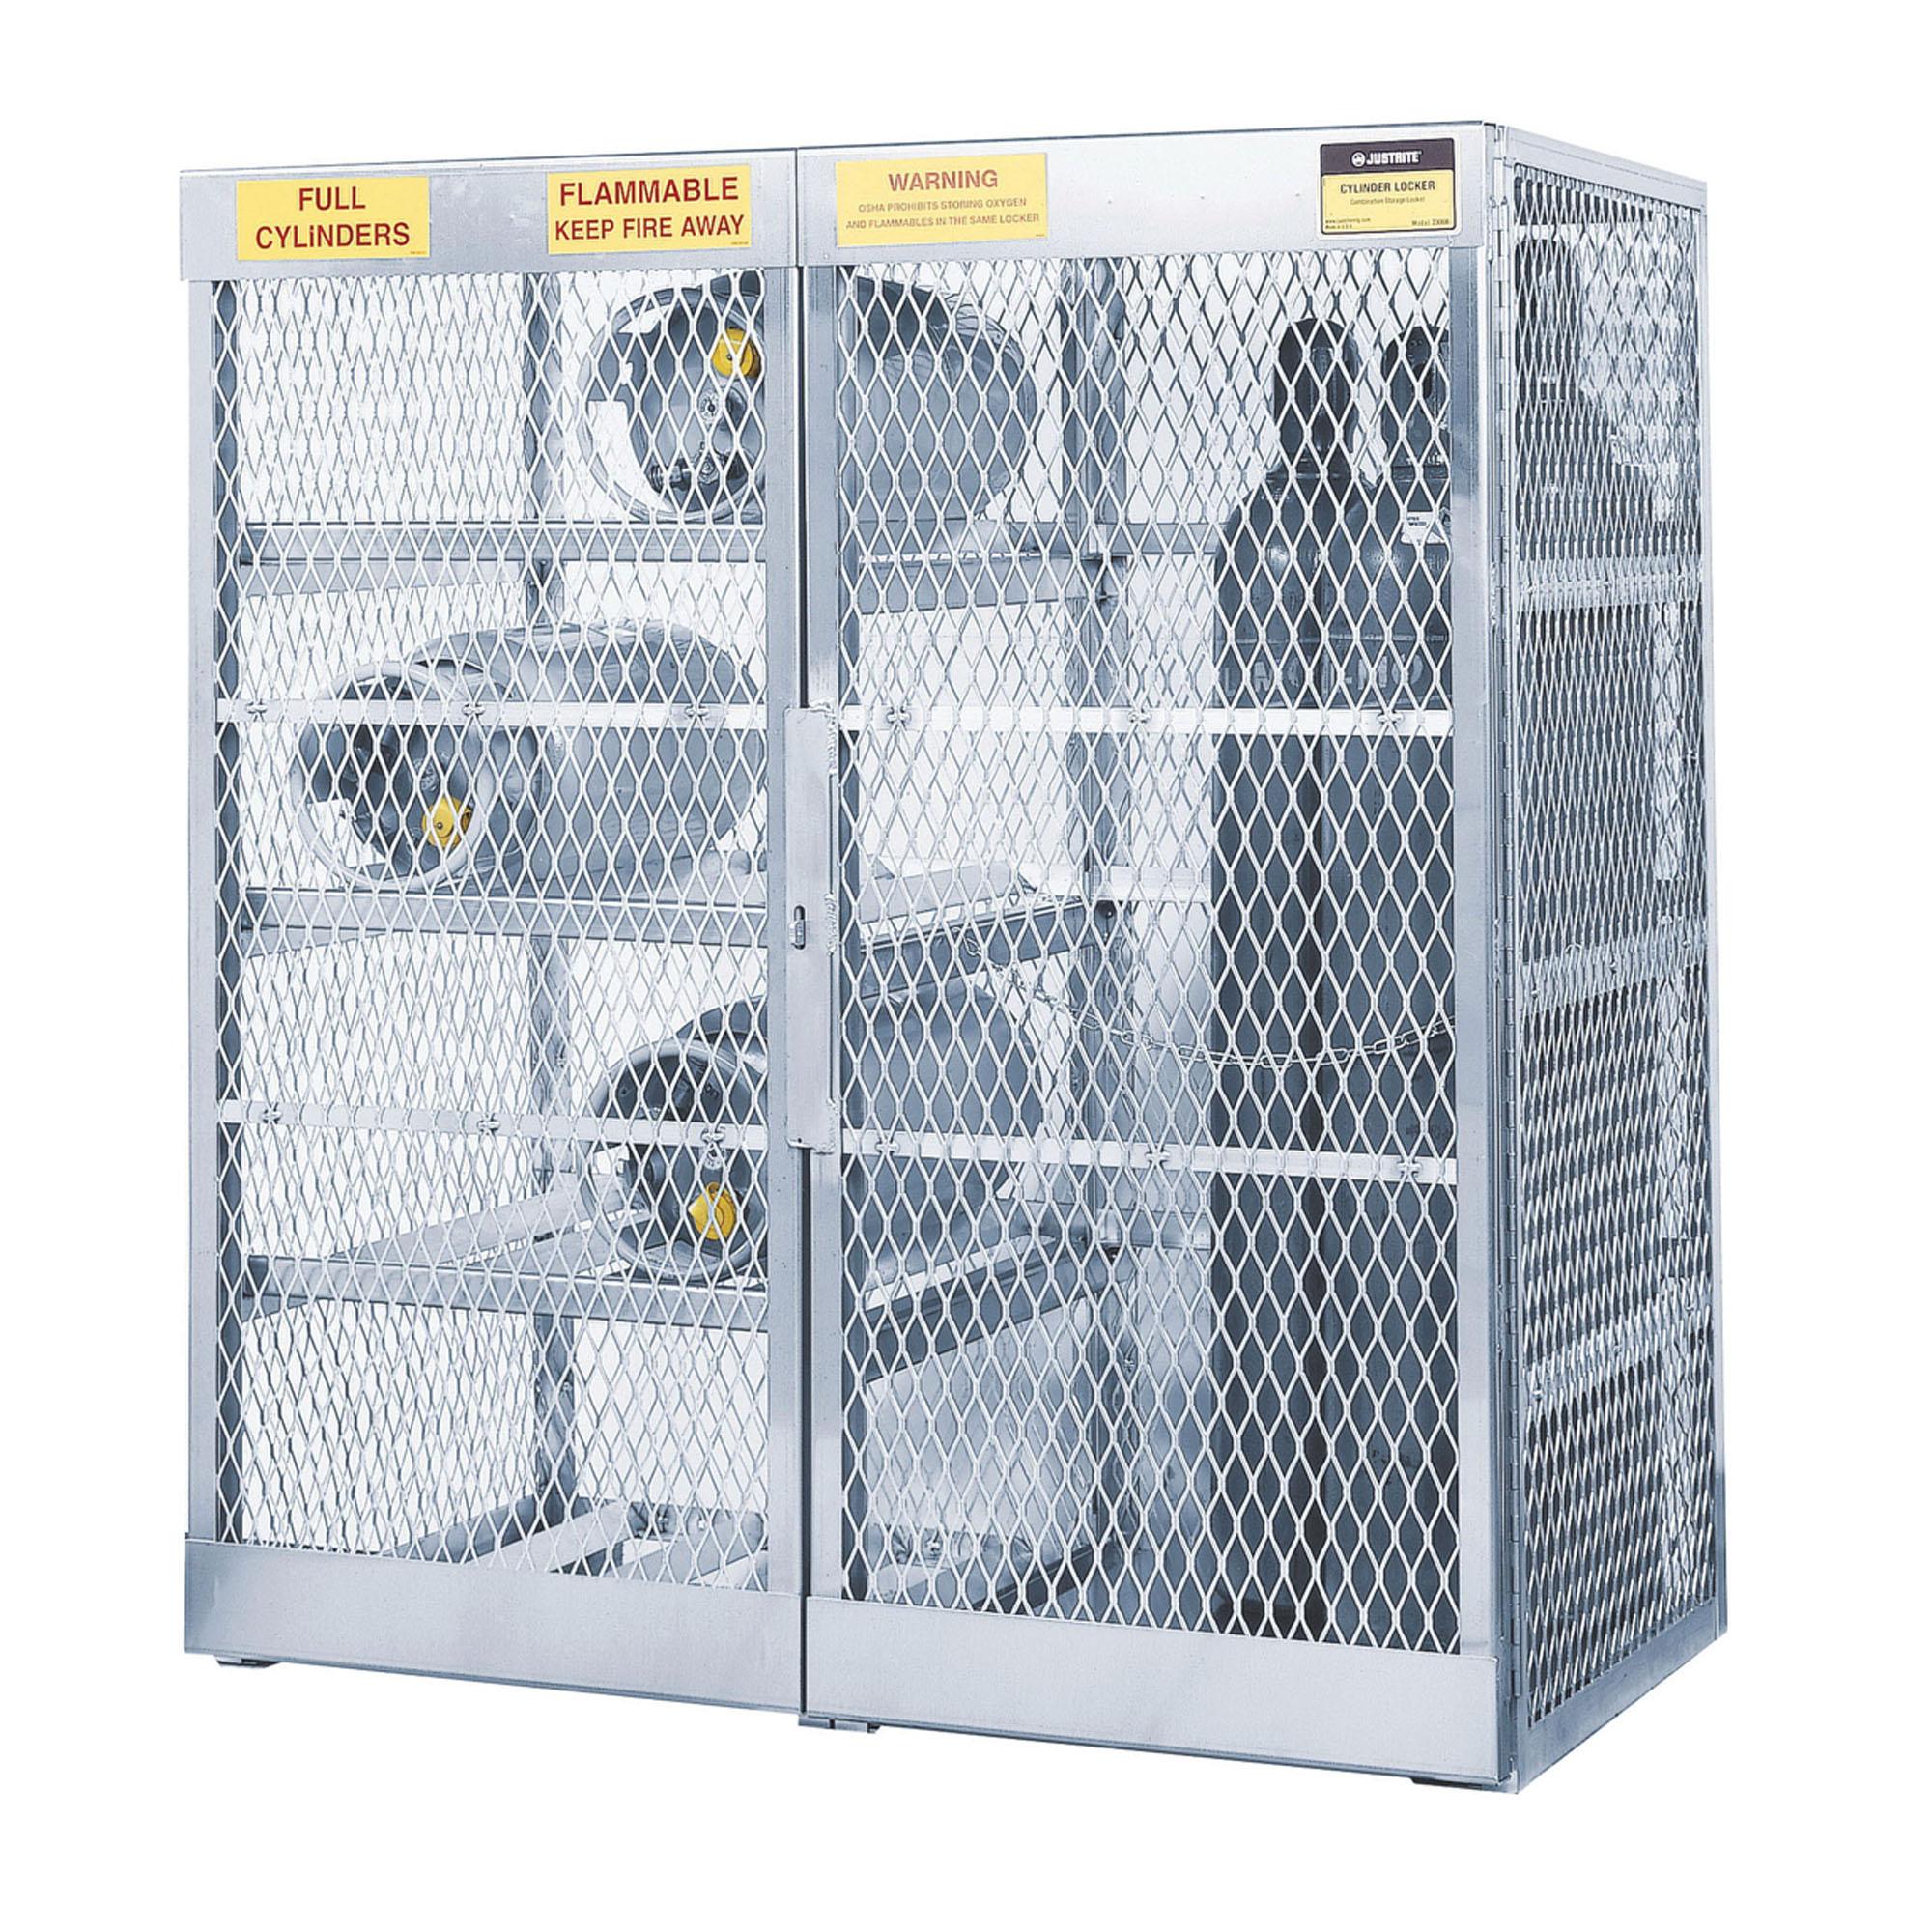 Justrite® 23008 Combo Cylinder Locker, 8 Horizontal/10 Vertical Cylinders, 65 in H x 60 in W x 32 in D, Aluminum Roof, Welded Aluminum, Aluminum